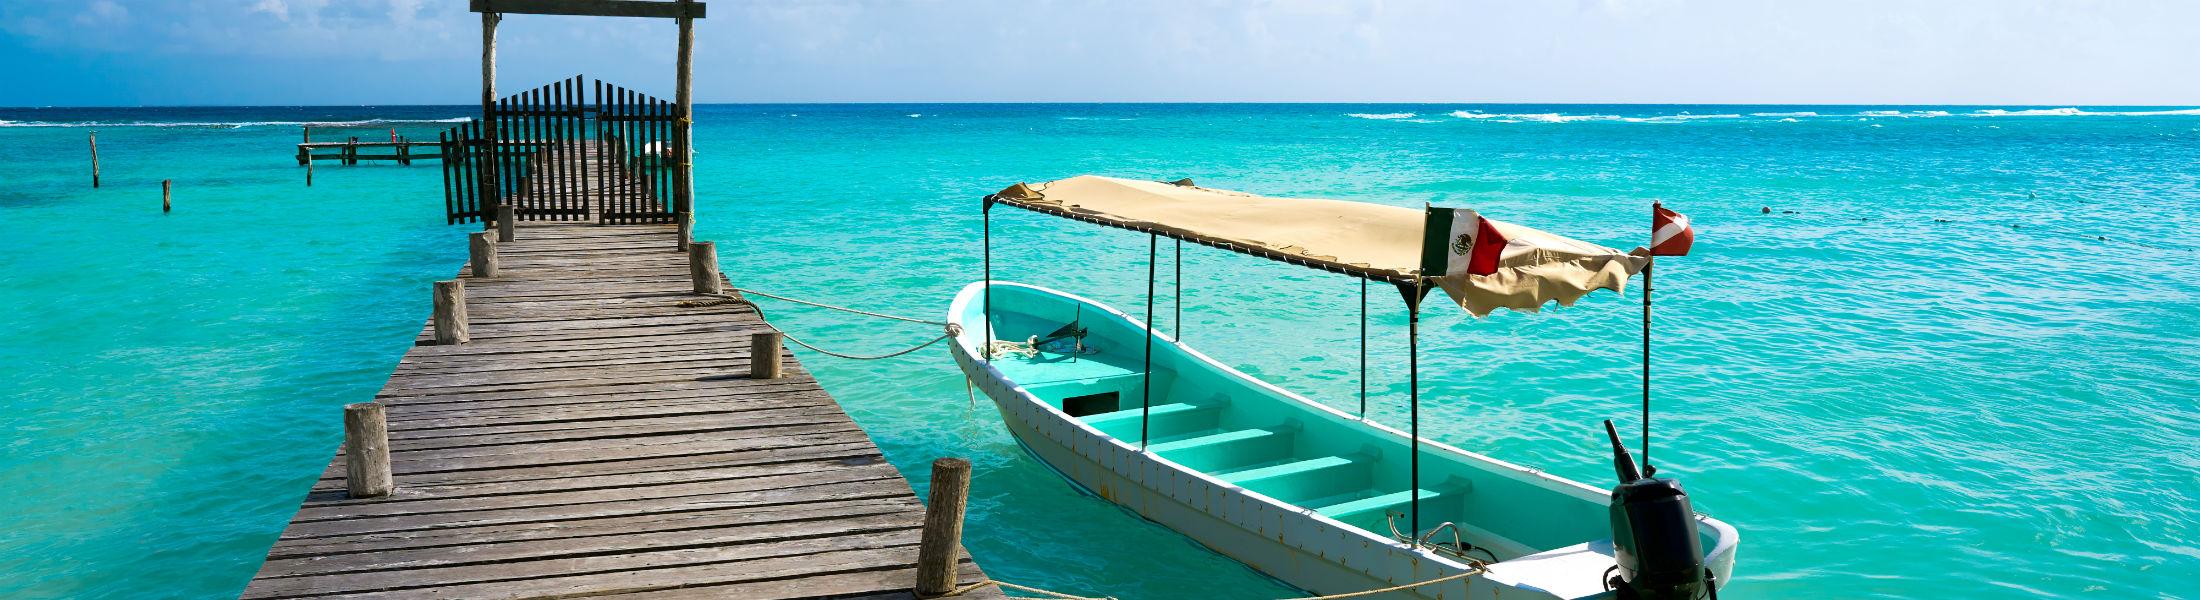 Caribbean beach pier in Costa Maya of Mayan Mexi